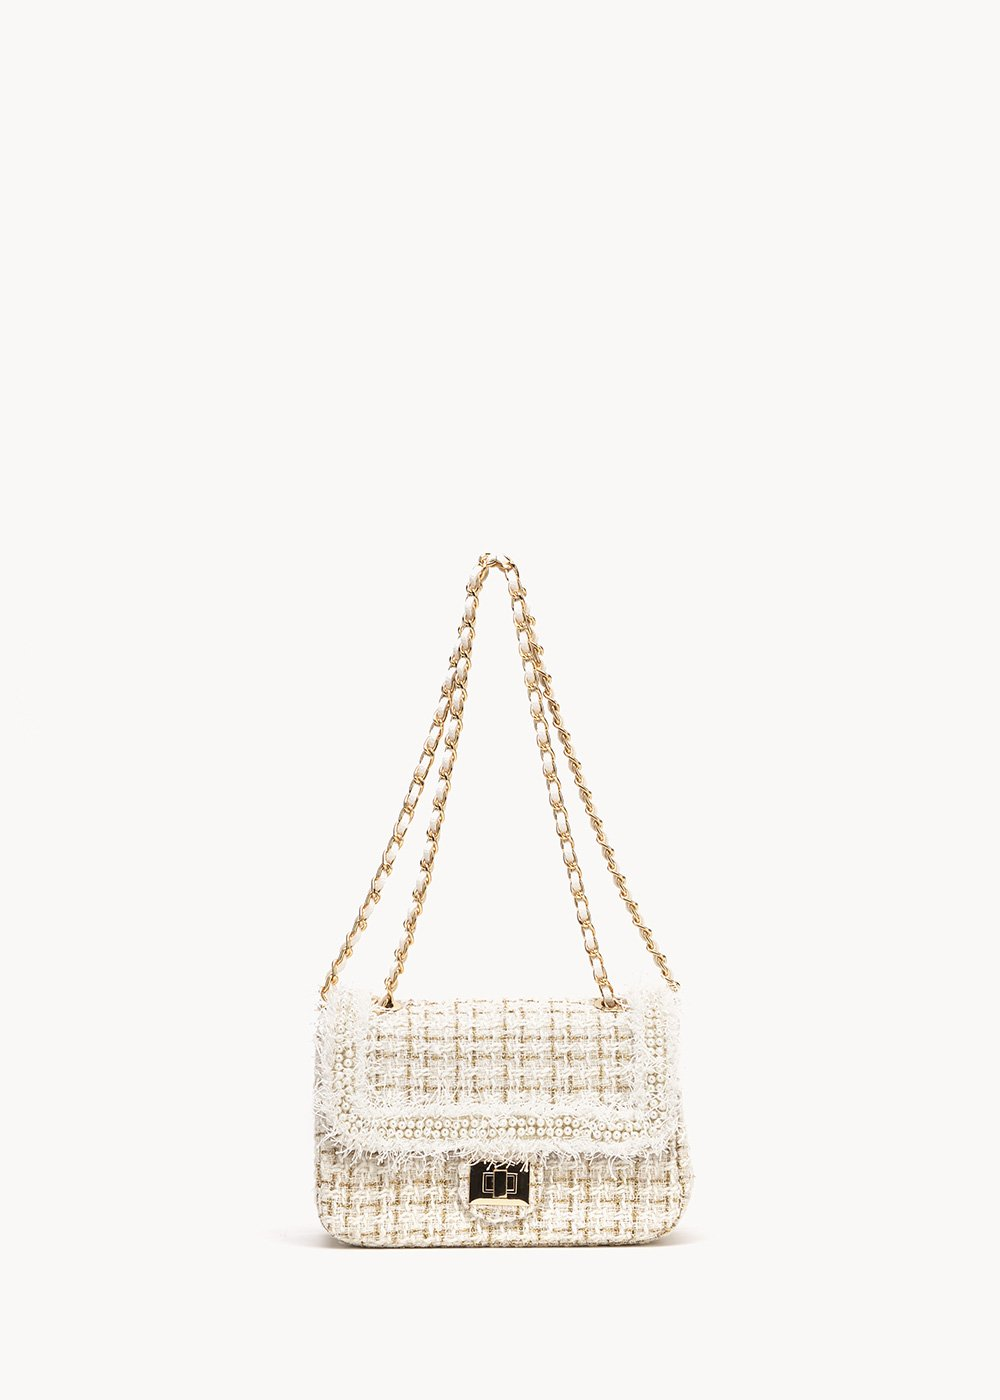 Briga clutch bag with pearls and bouclè fabric - Light Beige / White - Woman